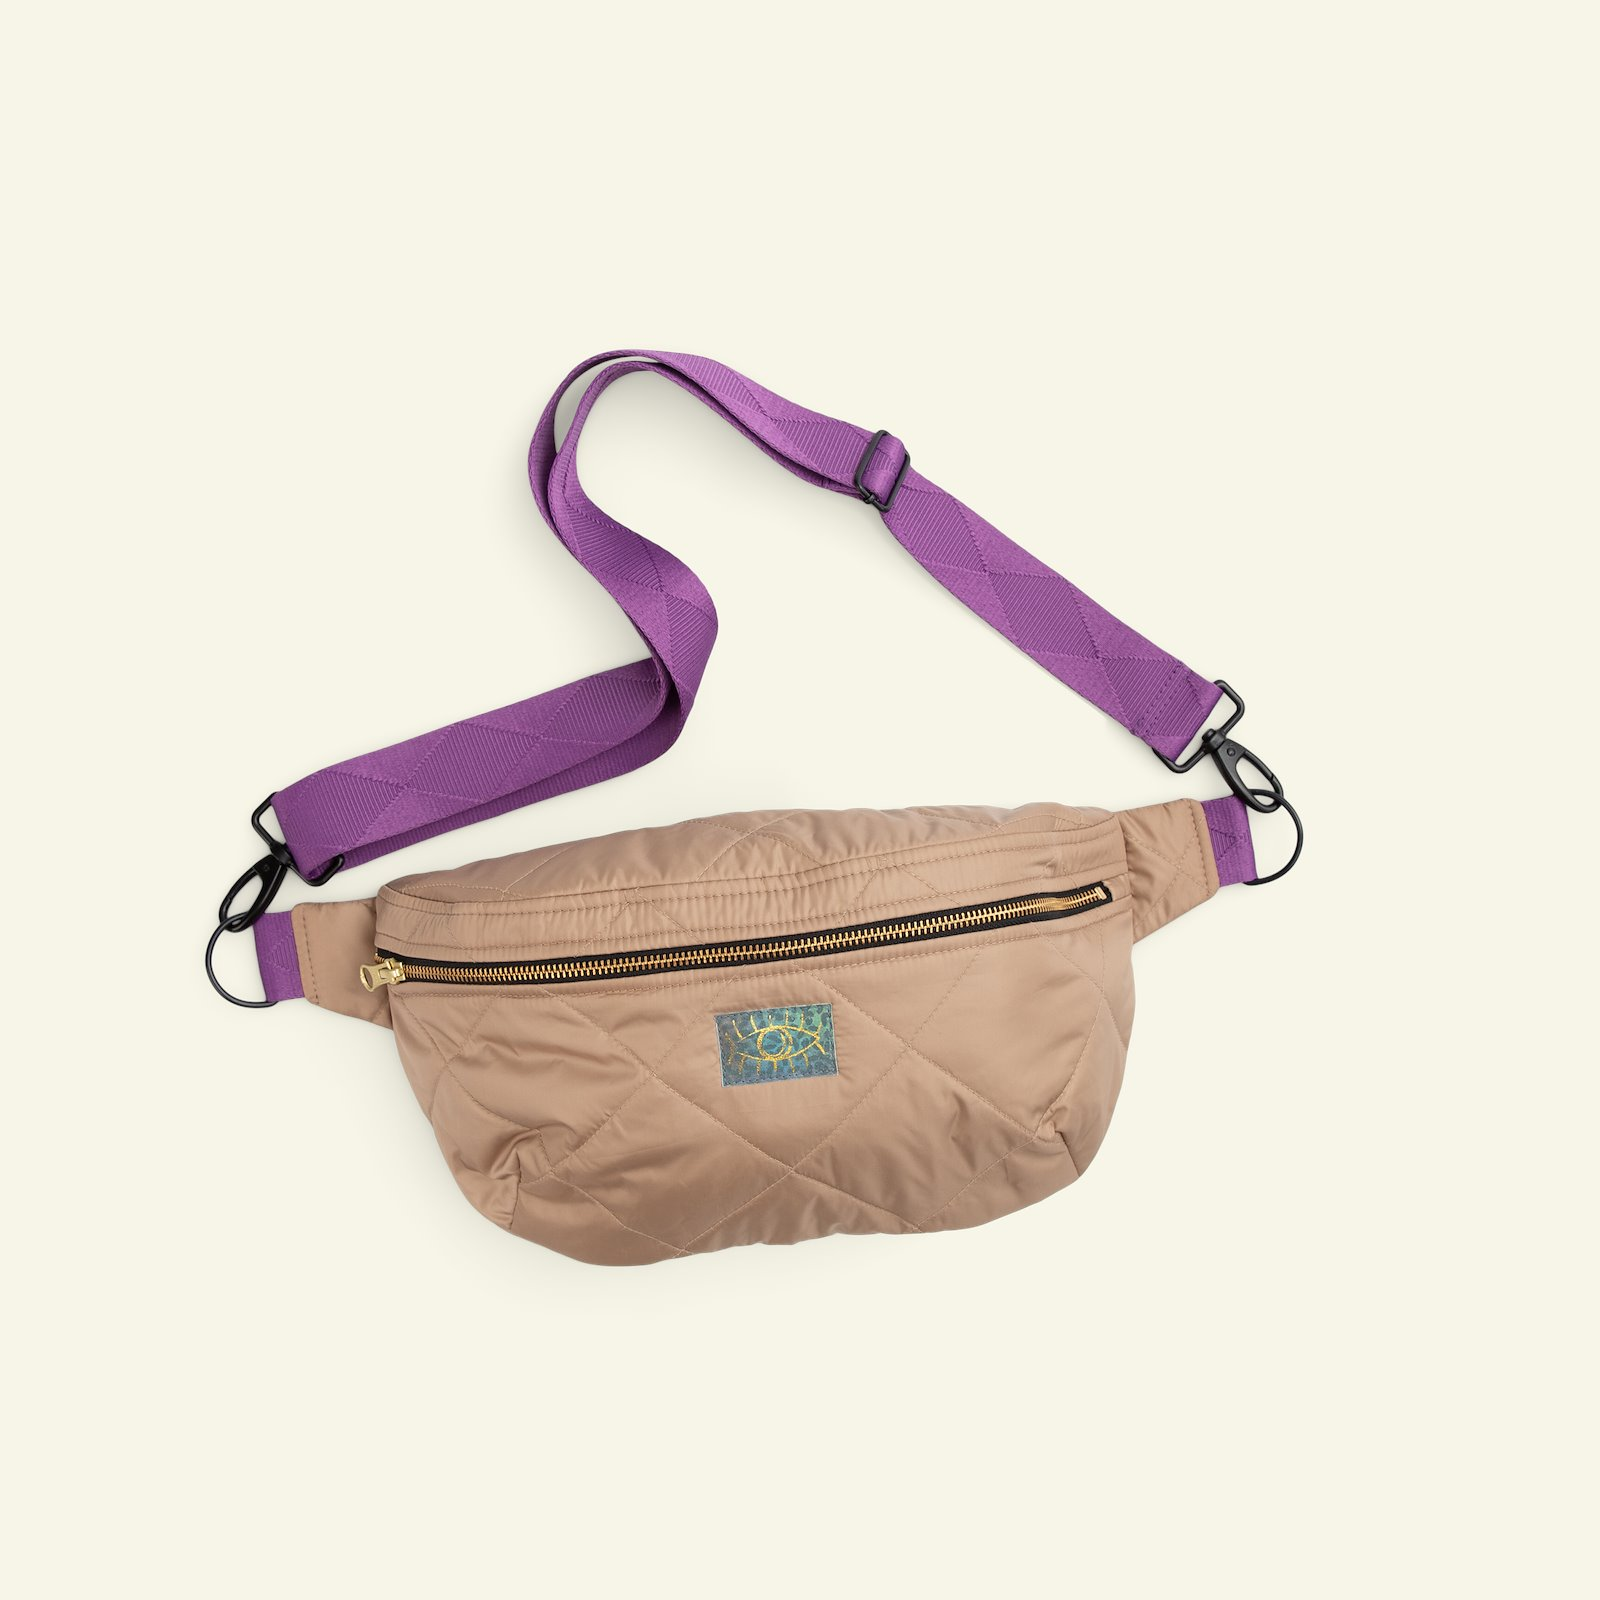 Boxy bum bag p90330_920233_22293_24817_z59373_sskit